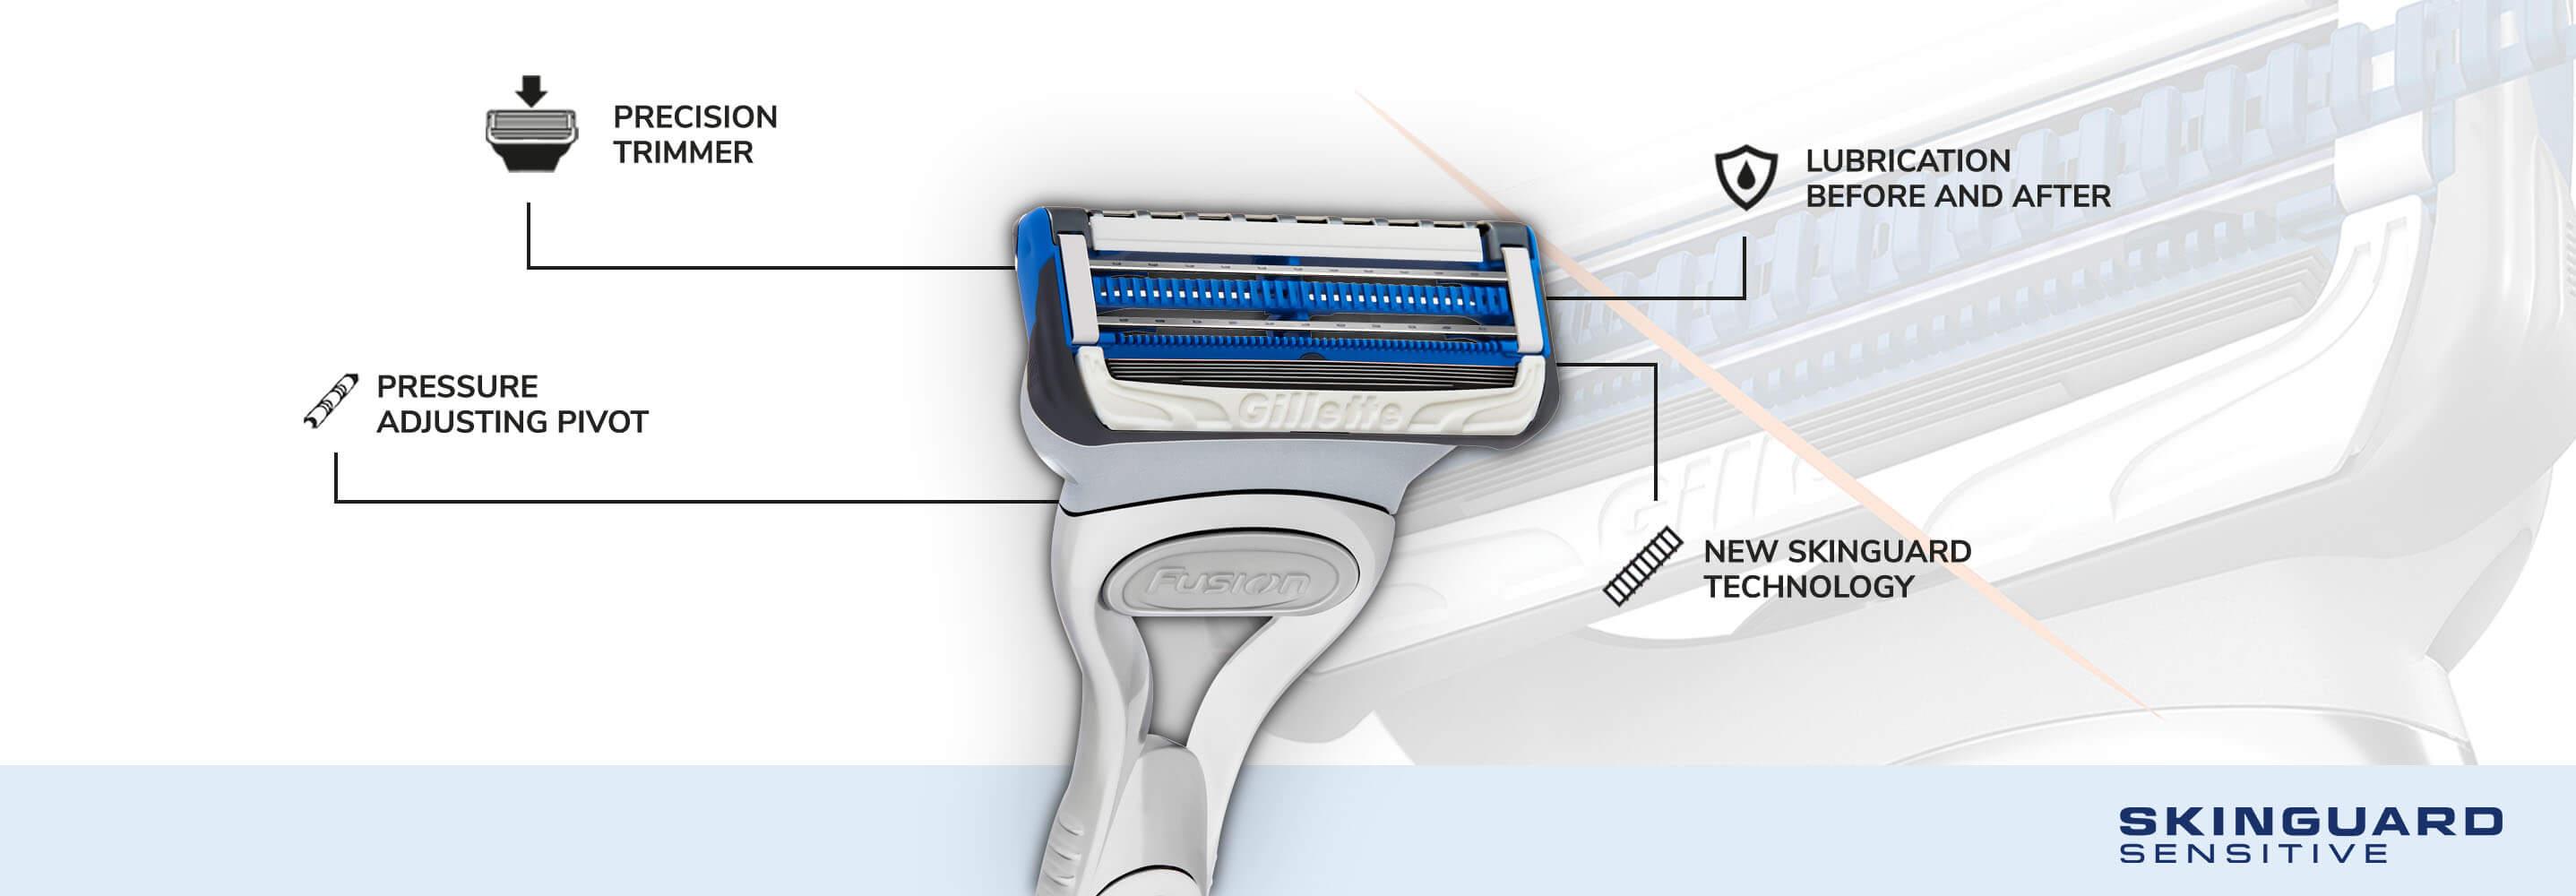 Gillette SkinGuard Sensitive razor illustration